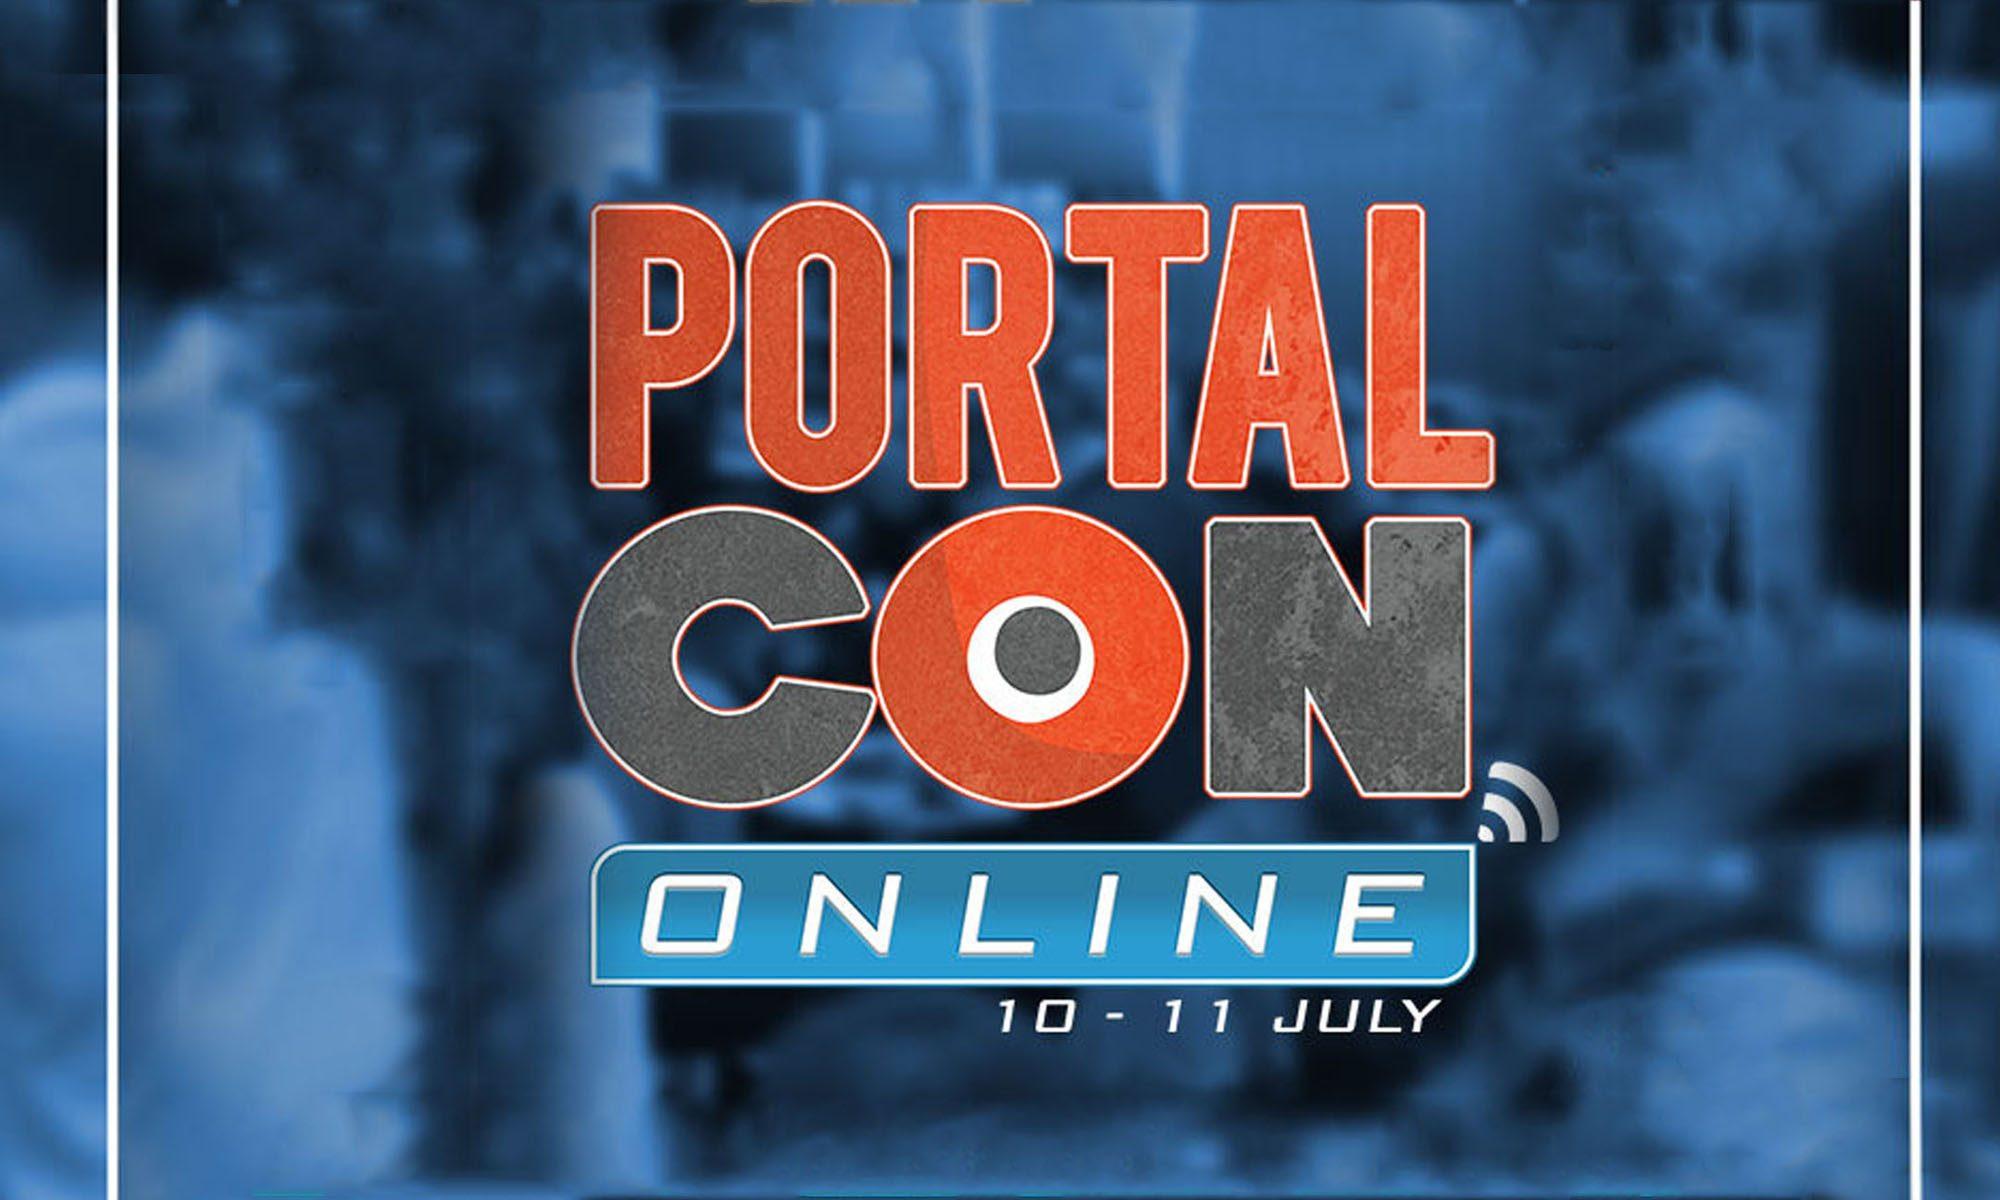 Portalcon Online